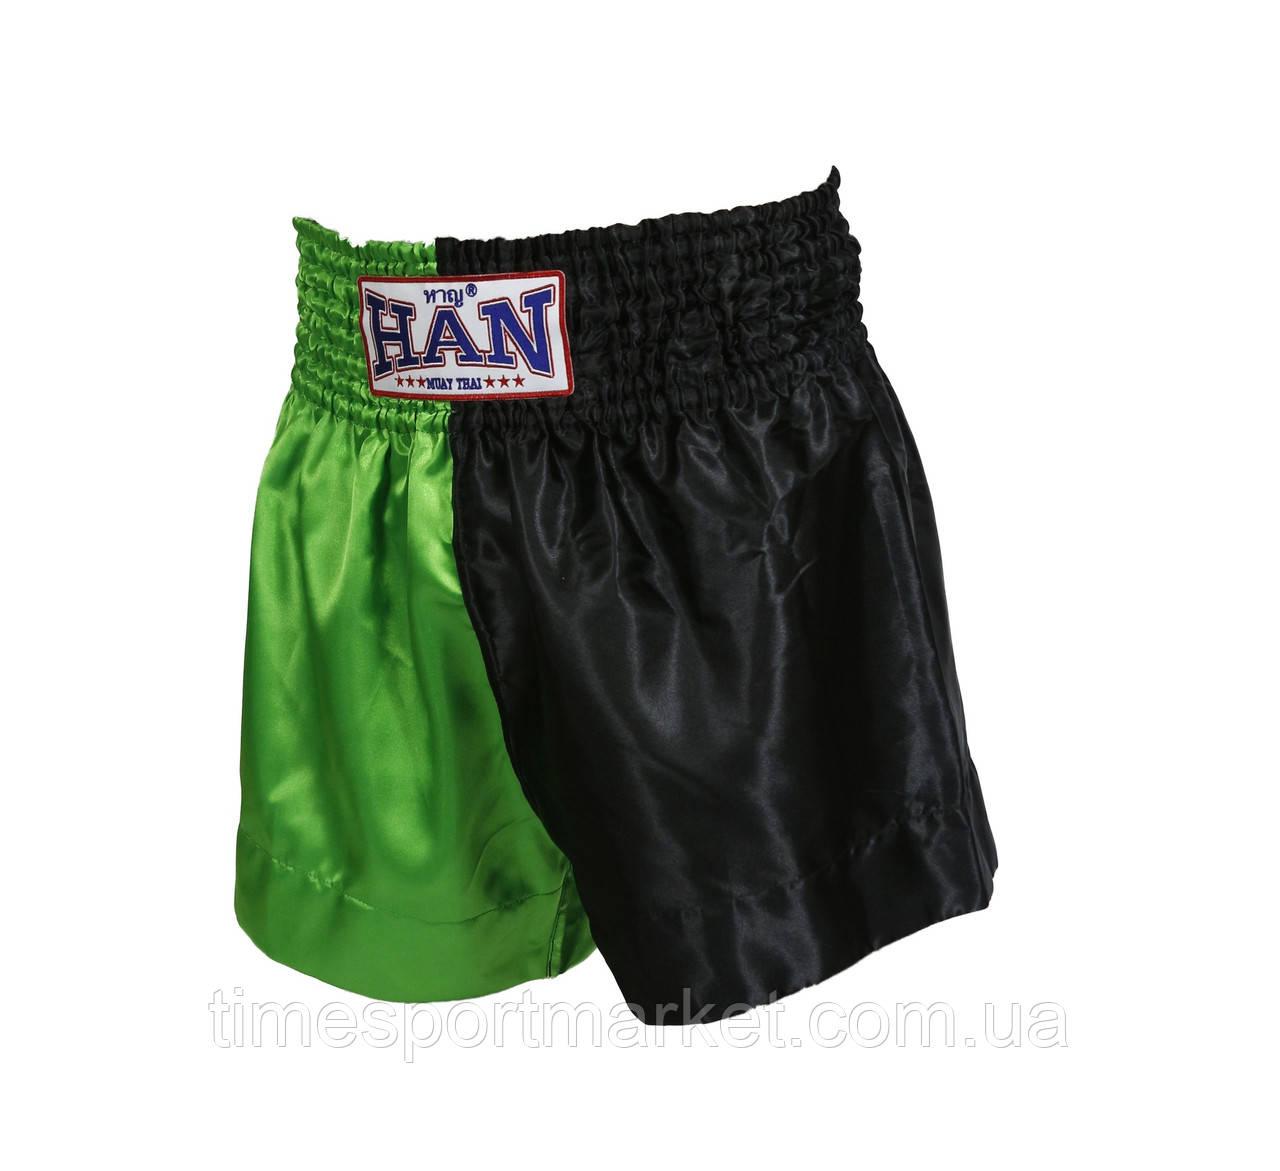 ШОРТЫ HAN MUAY THAI SHORTS GREEN/BLACK